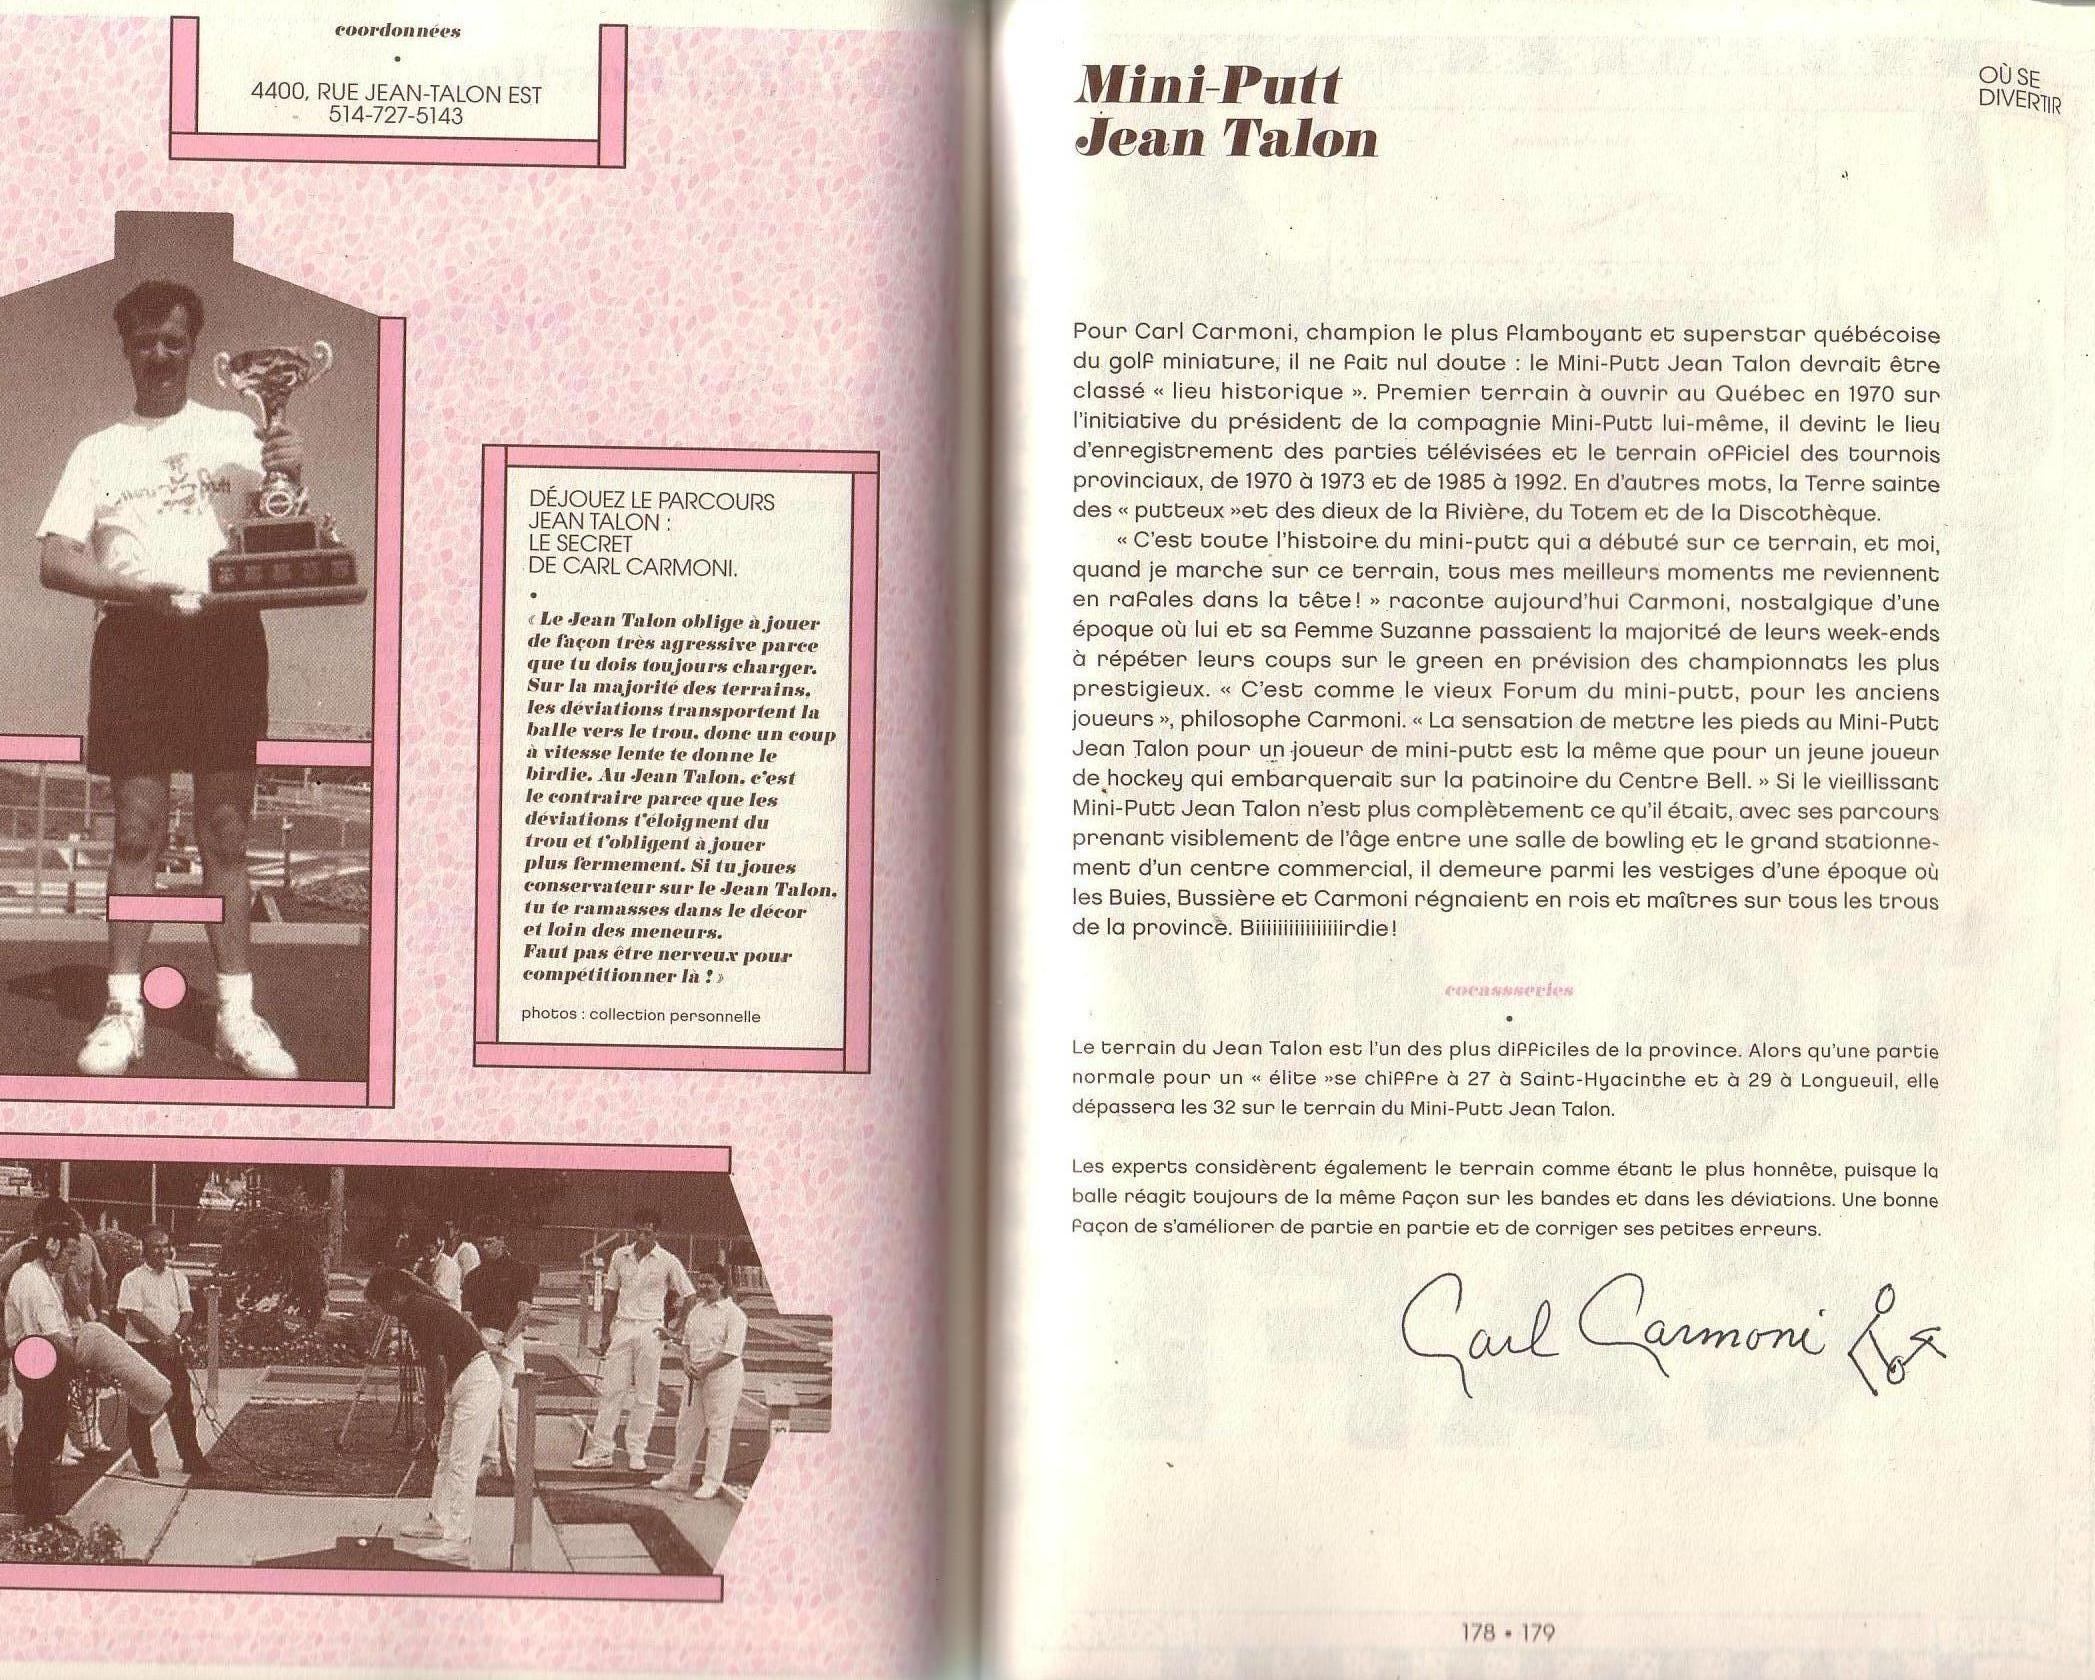 carl et montreal kitsch 2009